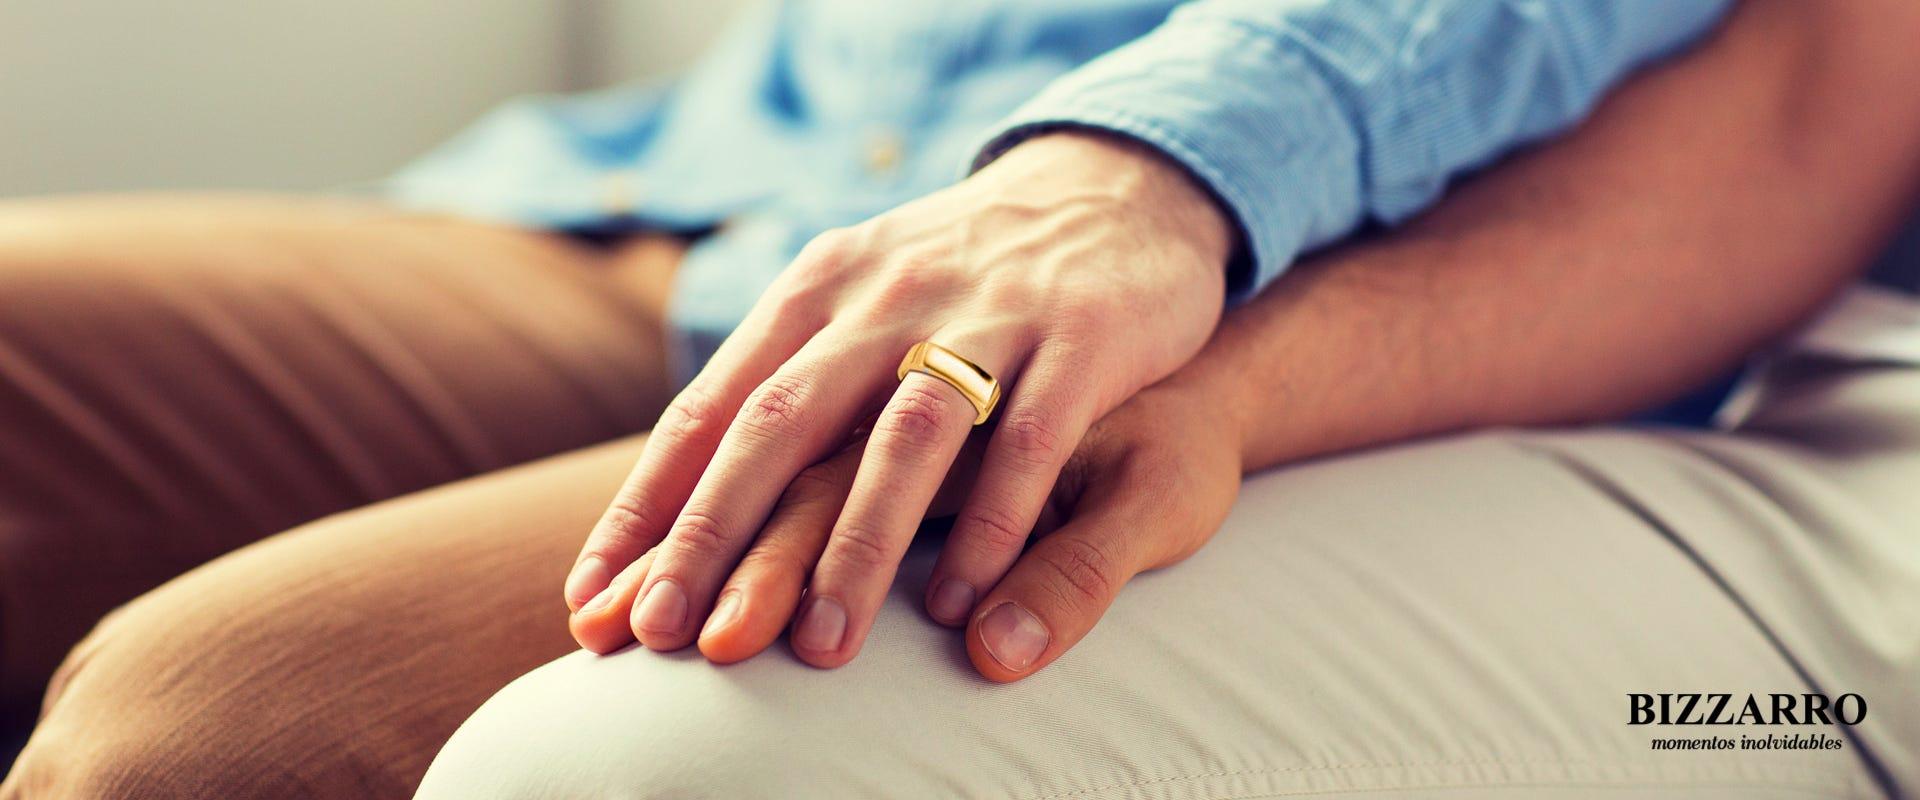 Anillo unisex, para conquistar el amor con orgullo